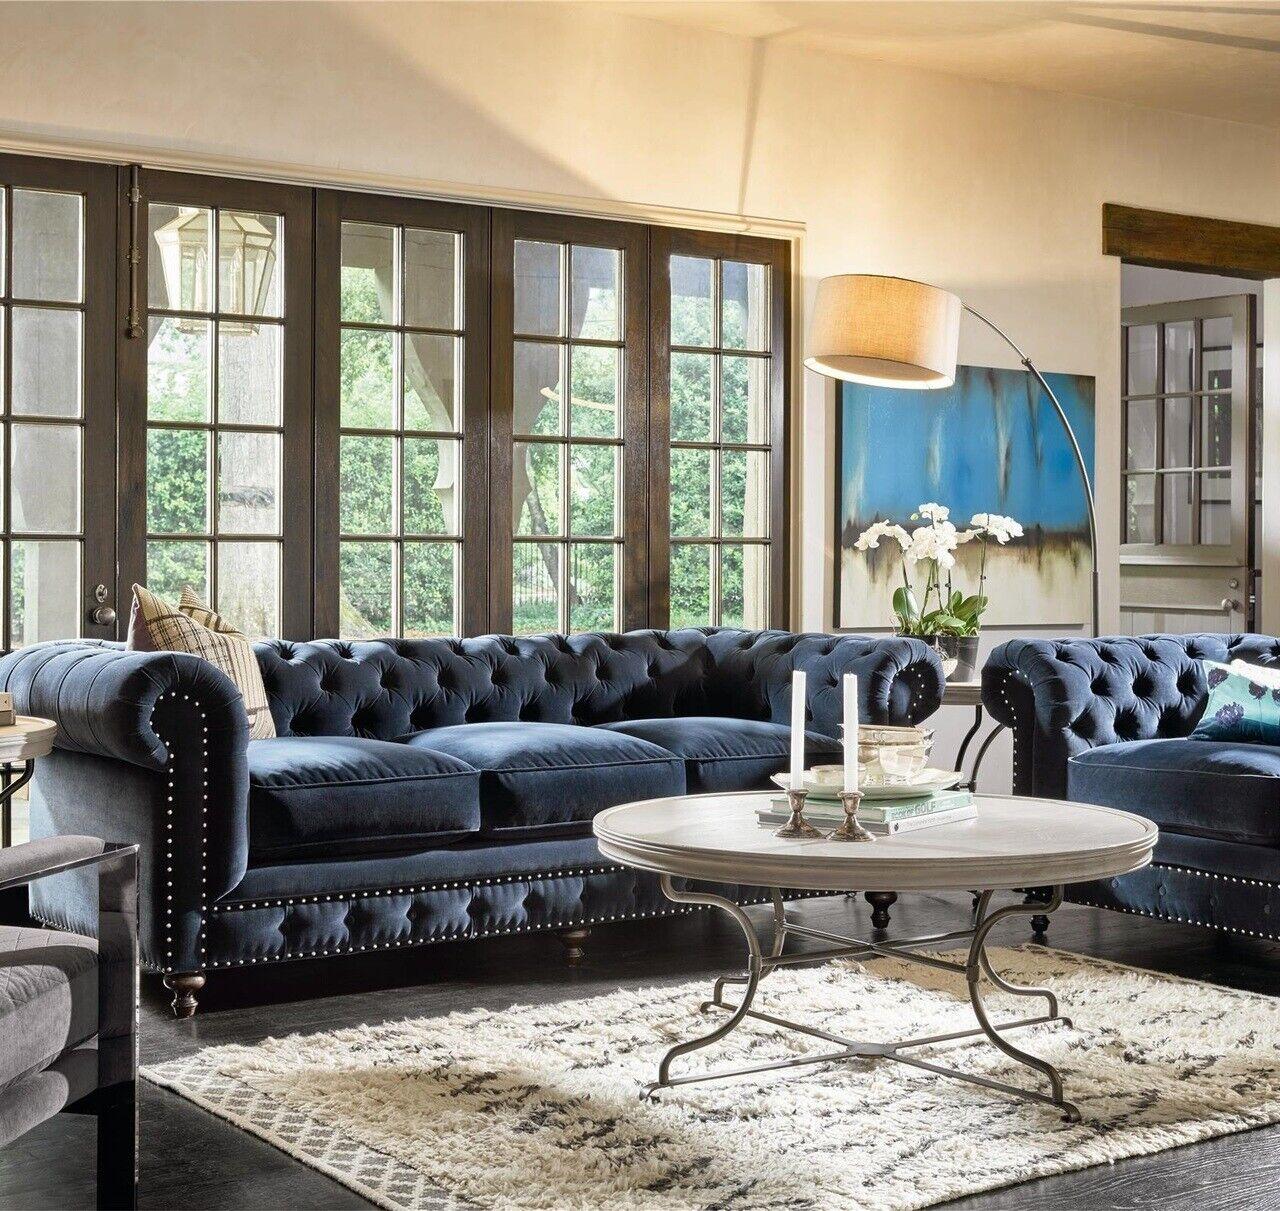 Chesterfield sofá couchen acolchado conjunto sofá tapizado de tela, cuero jvmoebel ®